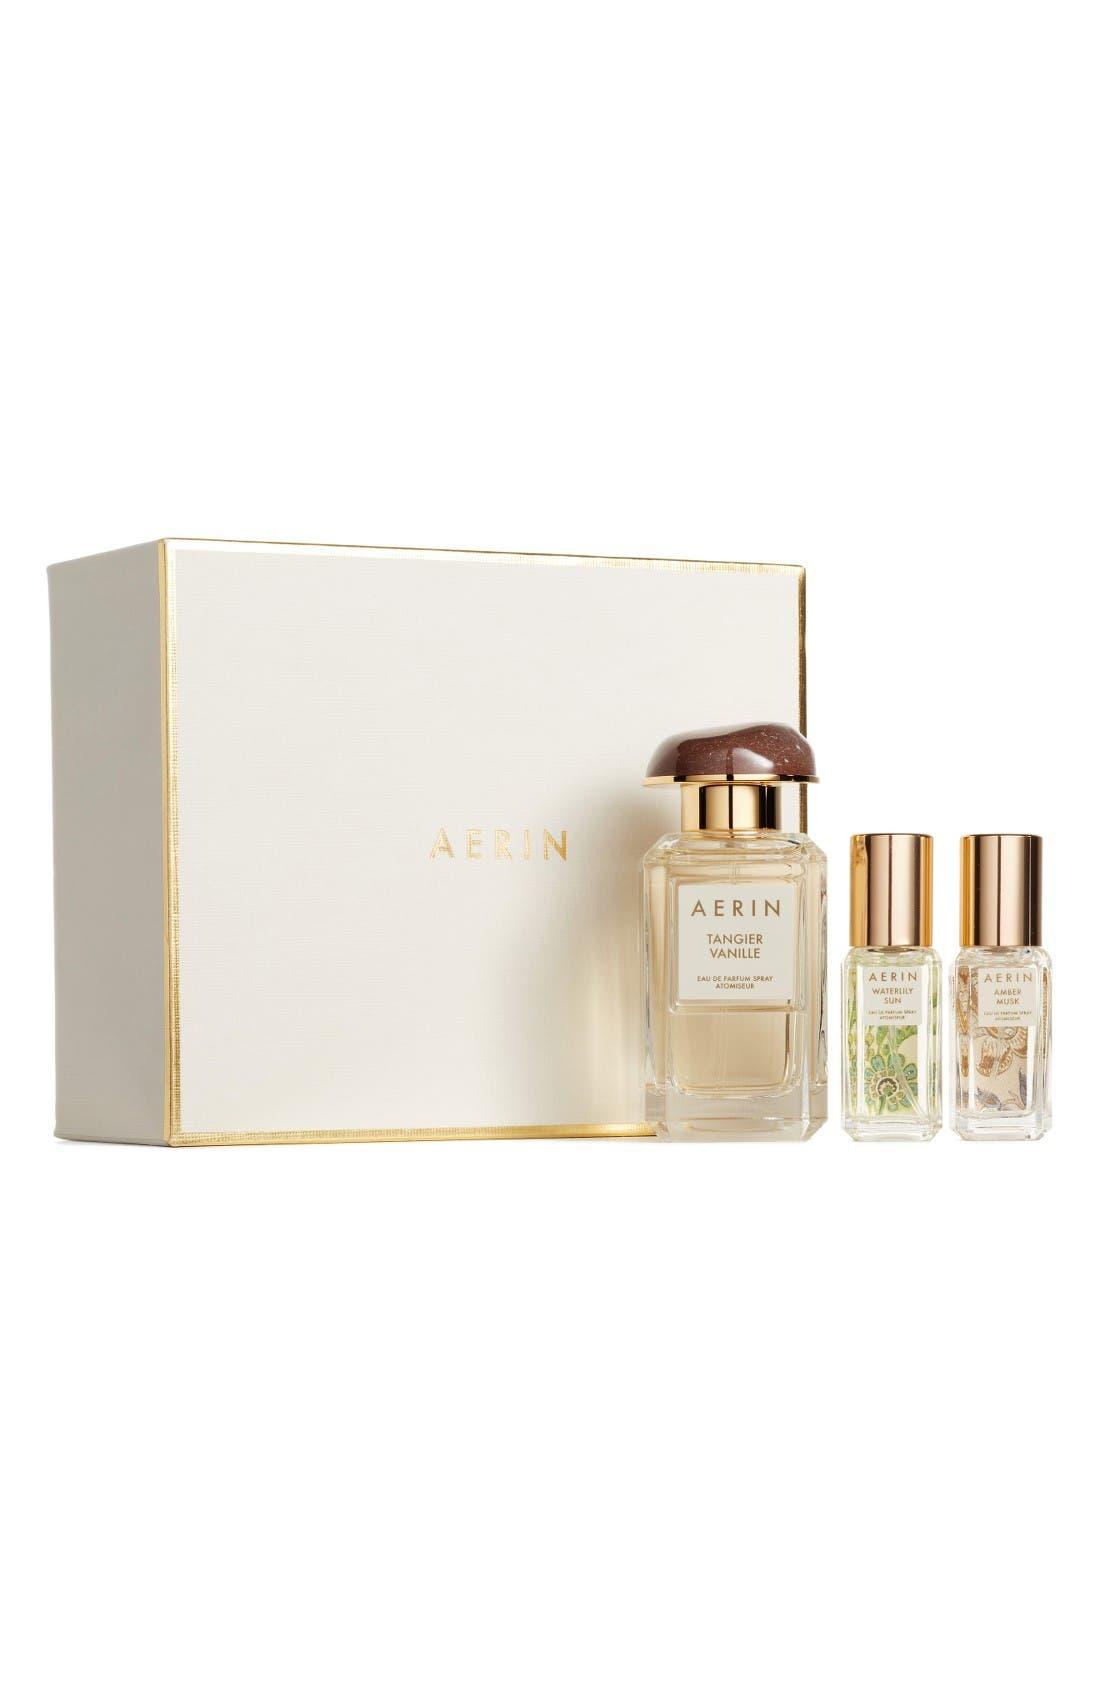 ESTÉE LAUDER AERIN Beauty Tangier Vanille Fragrance Set